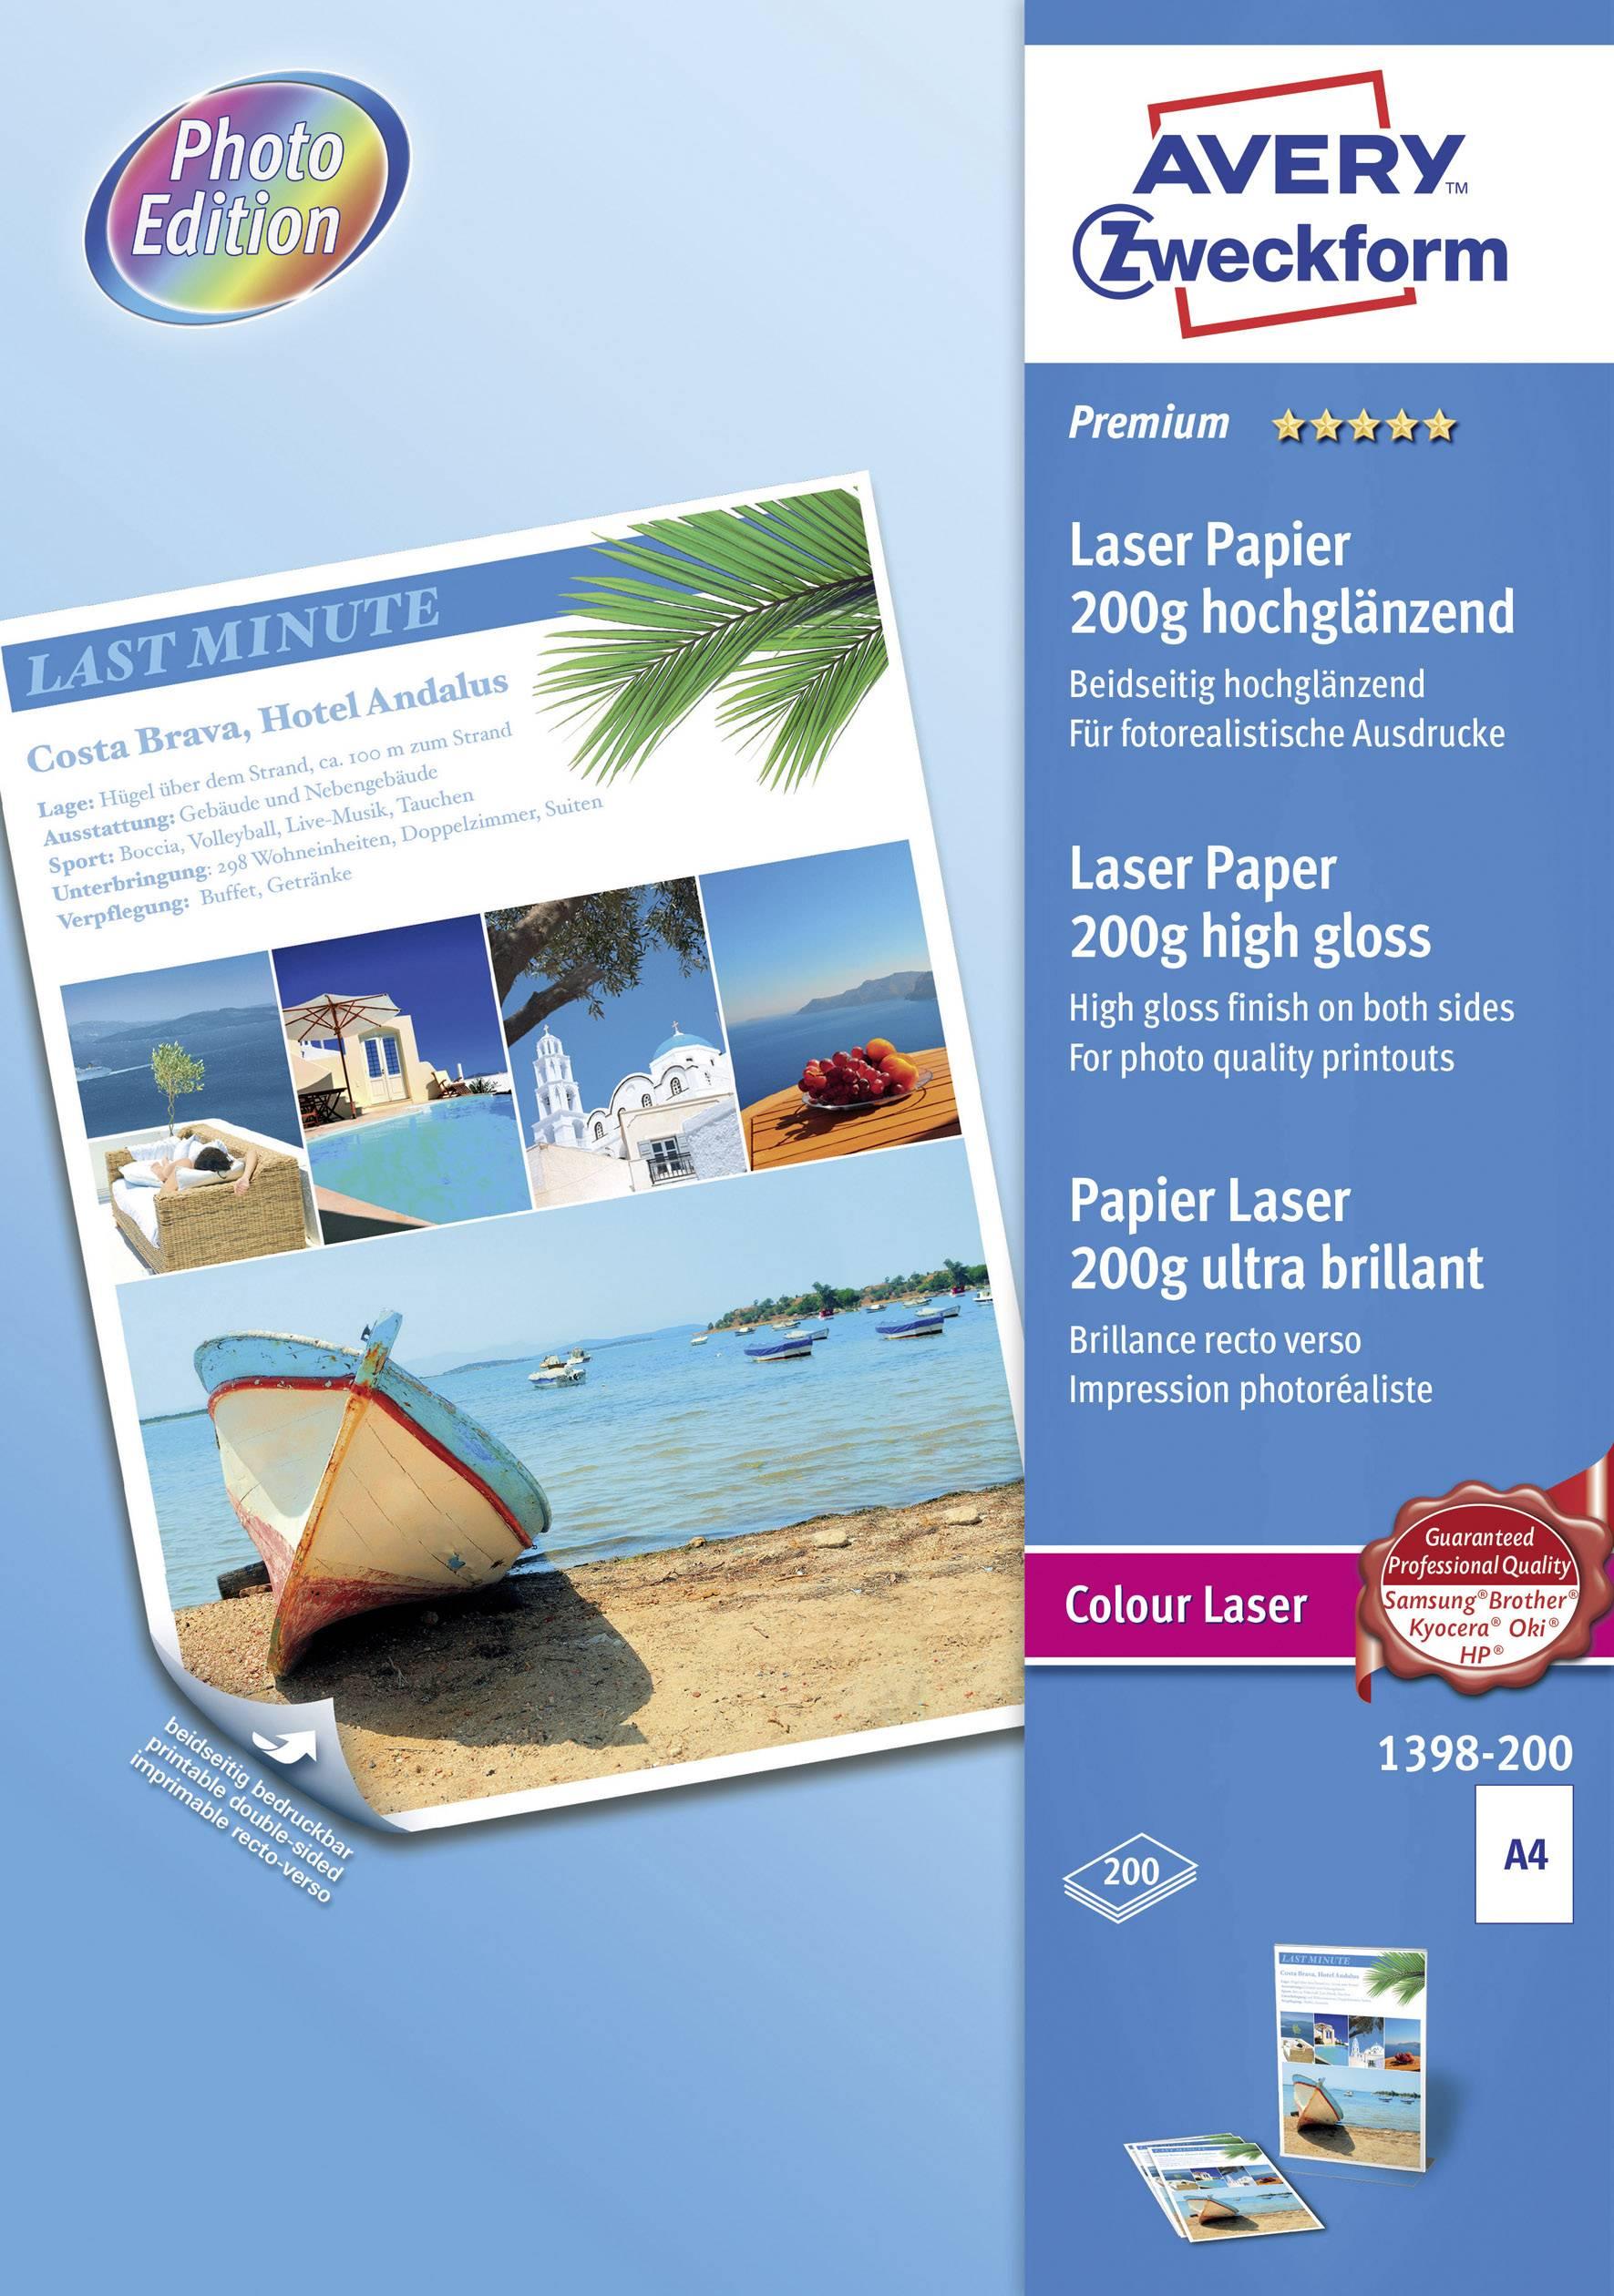 Endearing Laser Printer Paper Premium Laser Paper Laser Printer Paper Premium Laser Paper Laser Photo Paper Officeworks Laser Photo Paper A4 dpreview Laser Photo Paper